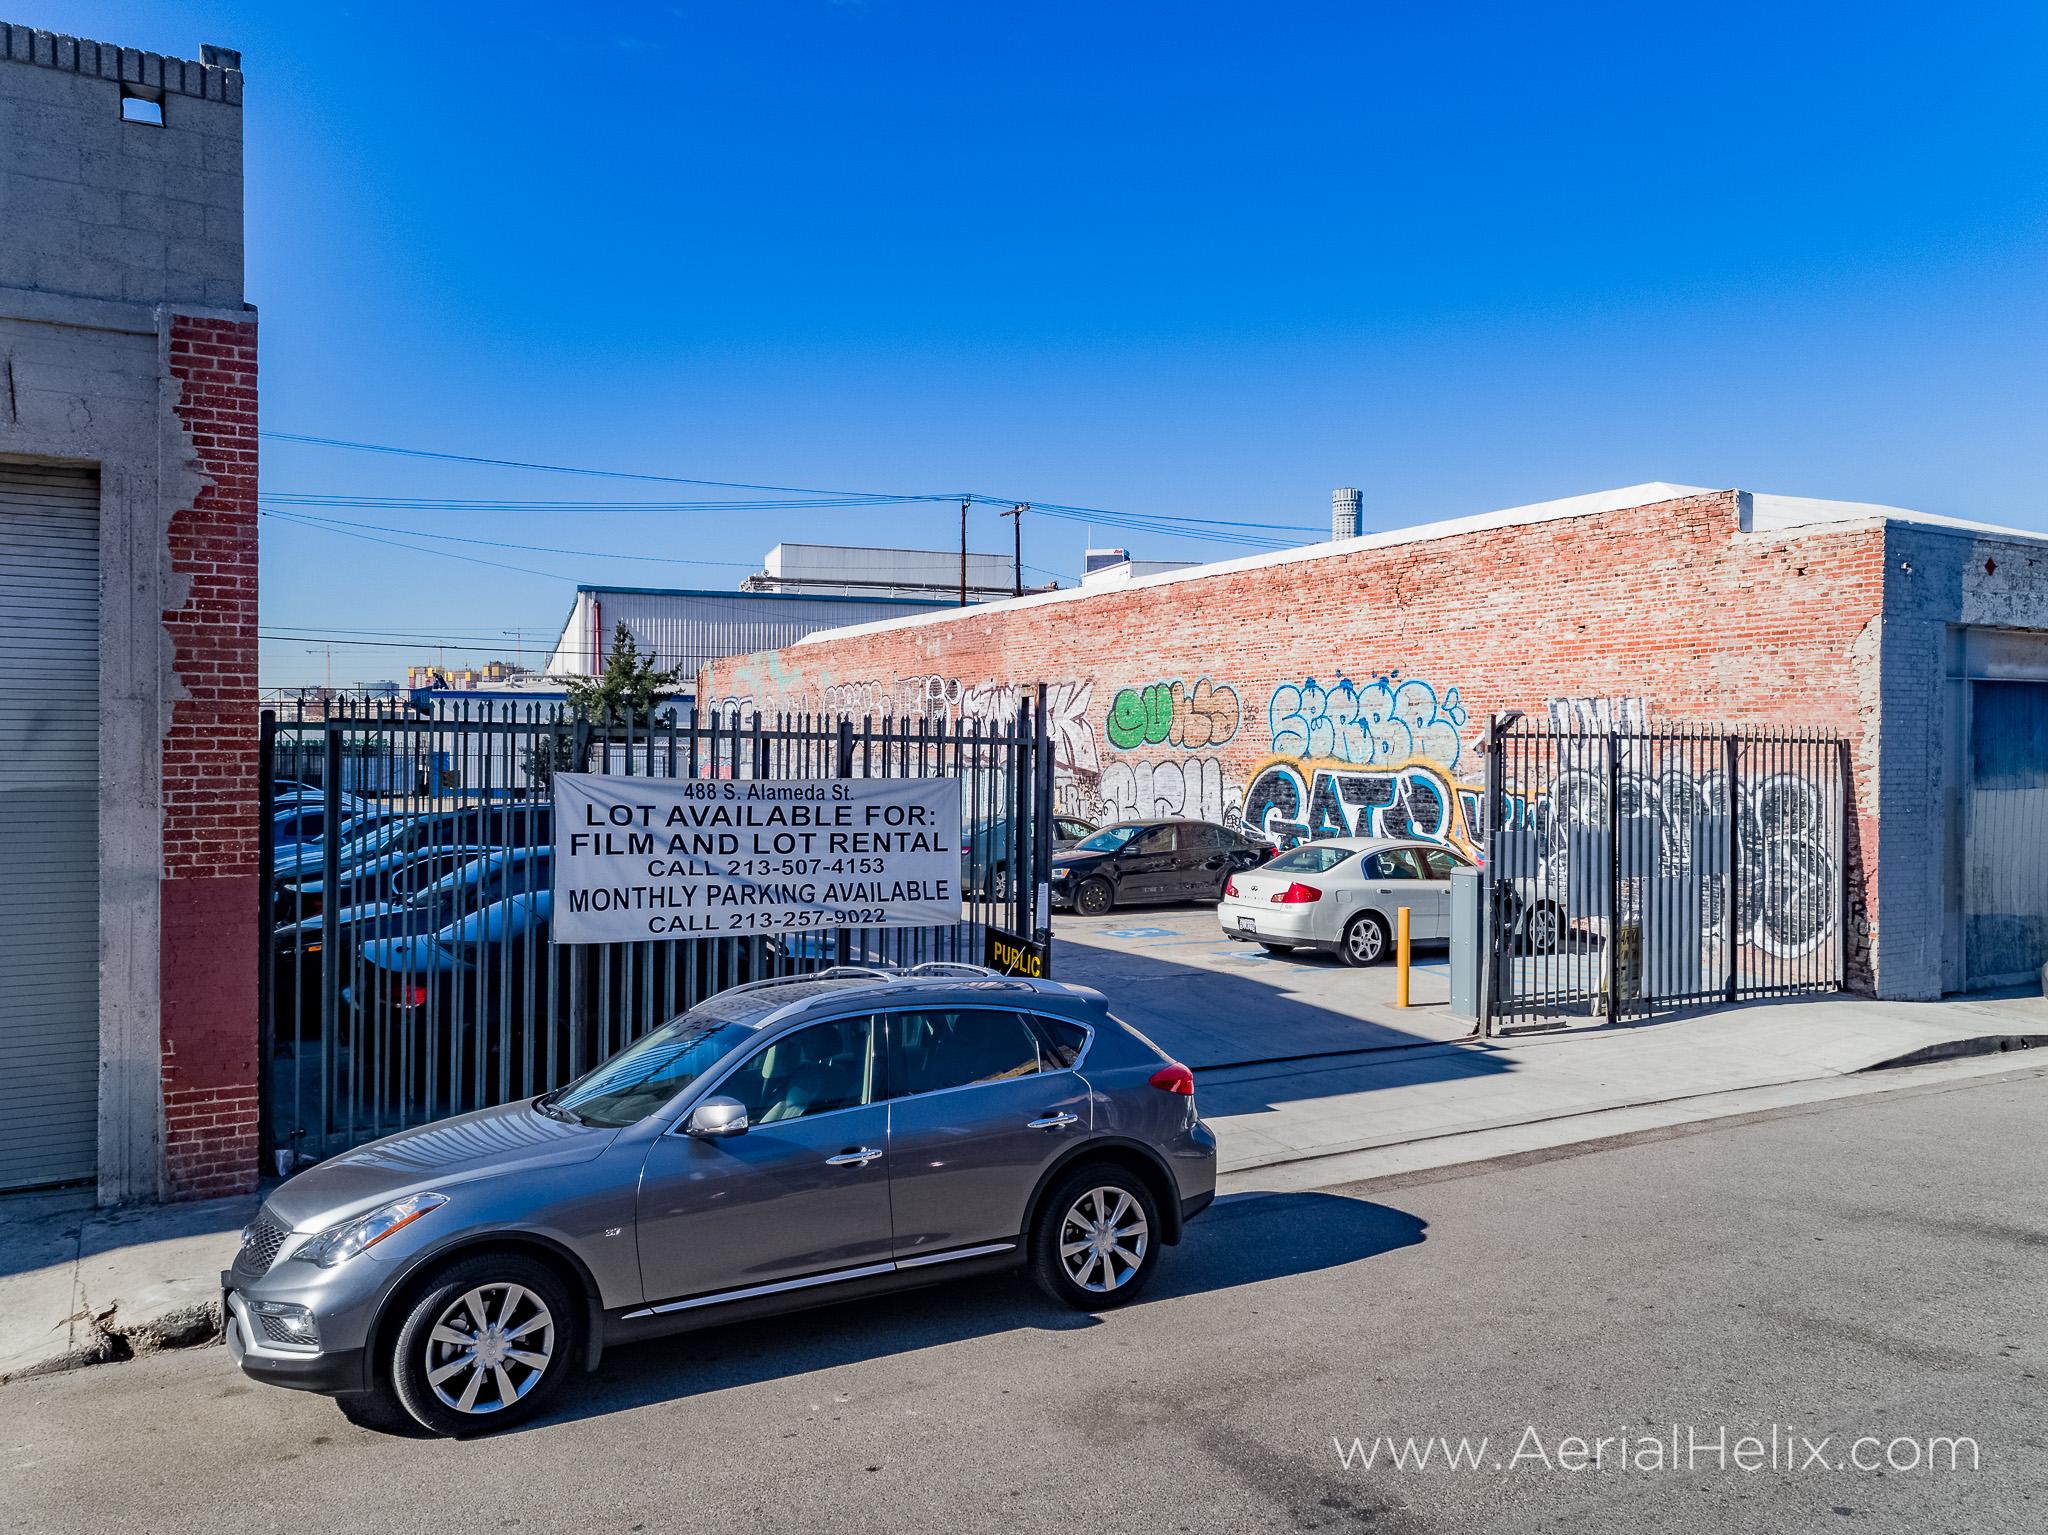 Perfect Parking 2 aerial photographer-10.jpg